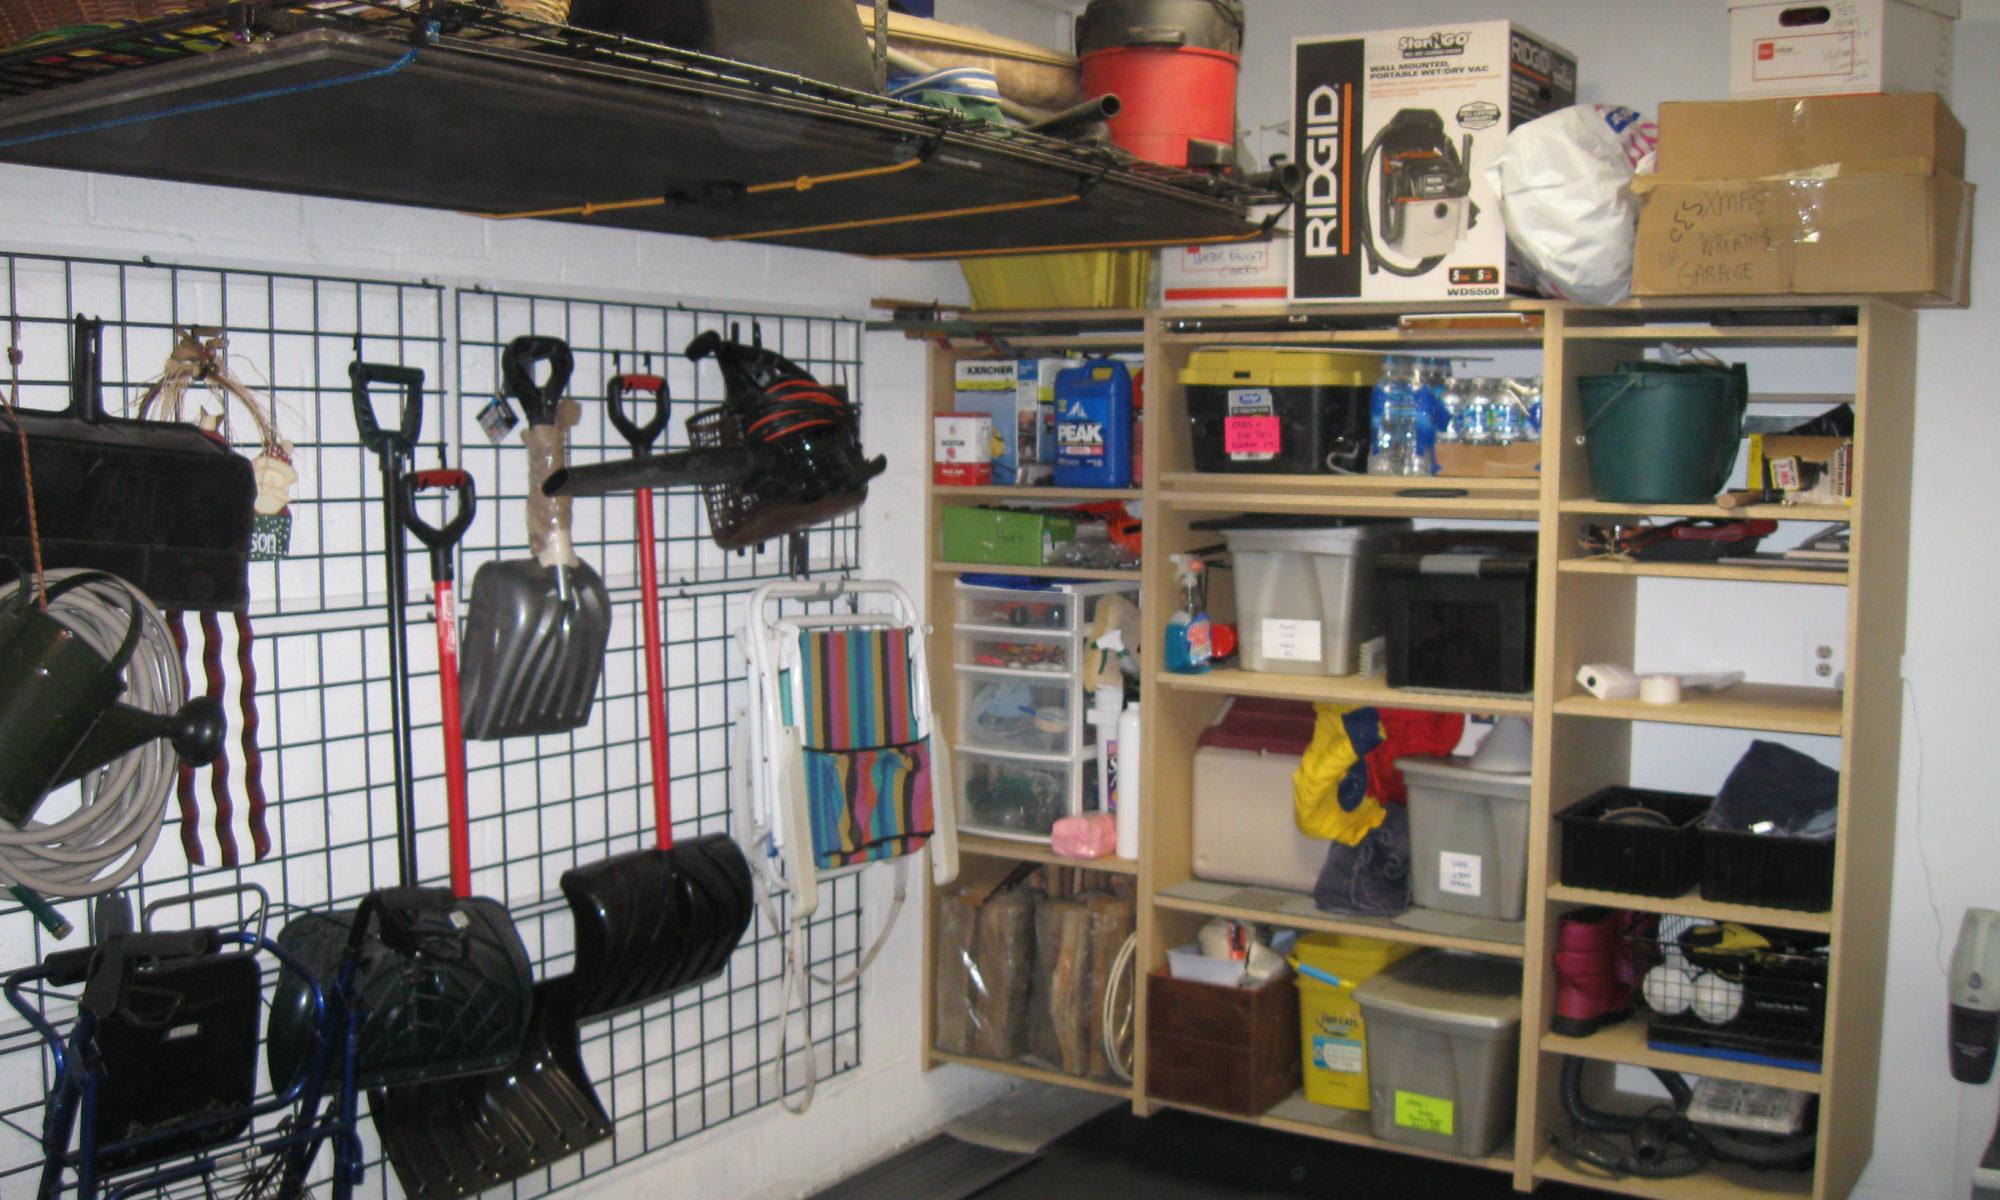 Is Measurement Important Before Purchasing a New Garage Door?